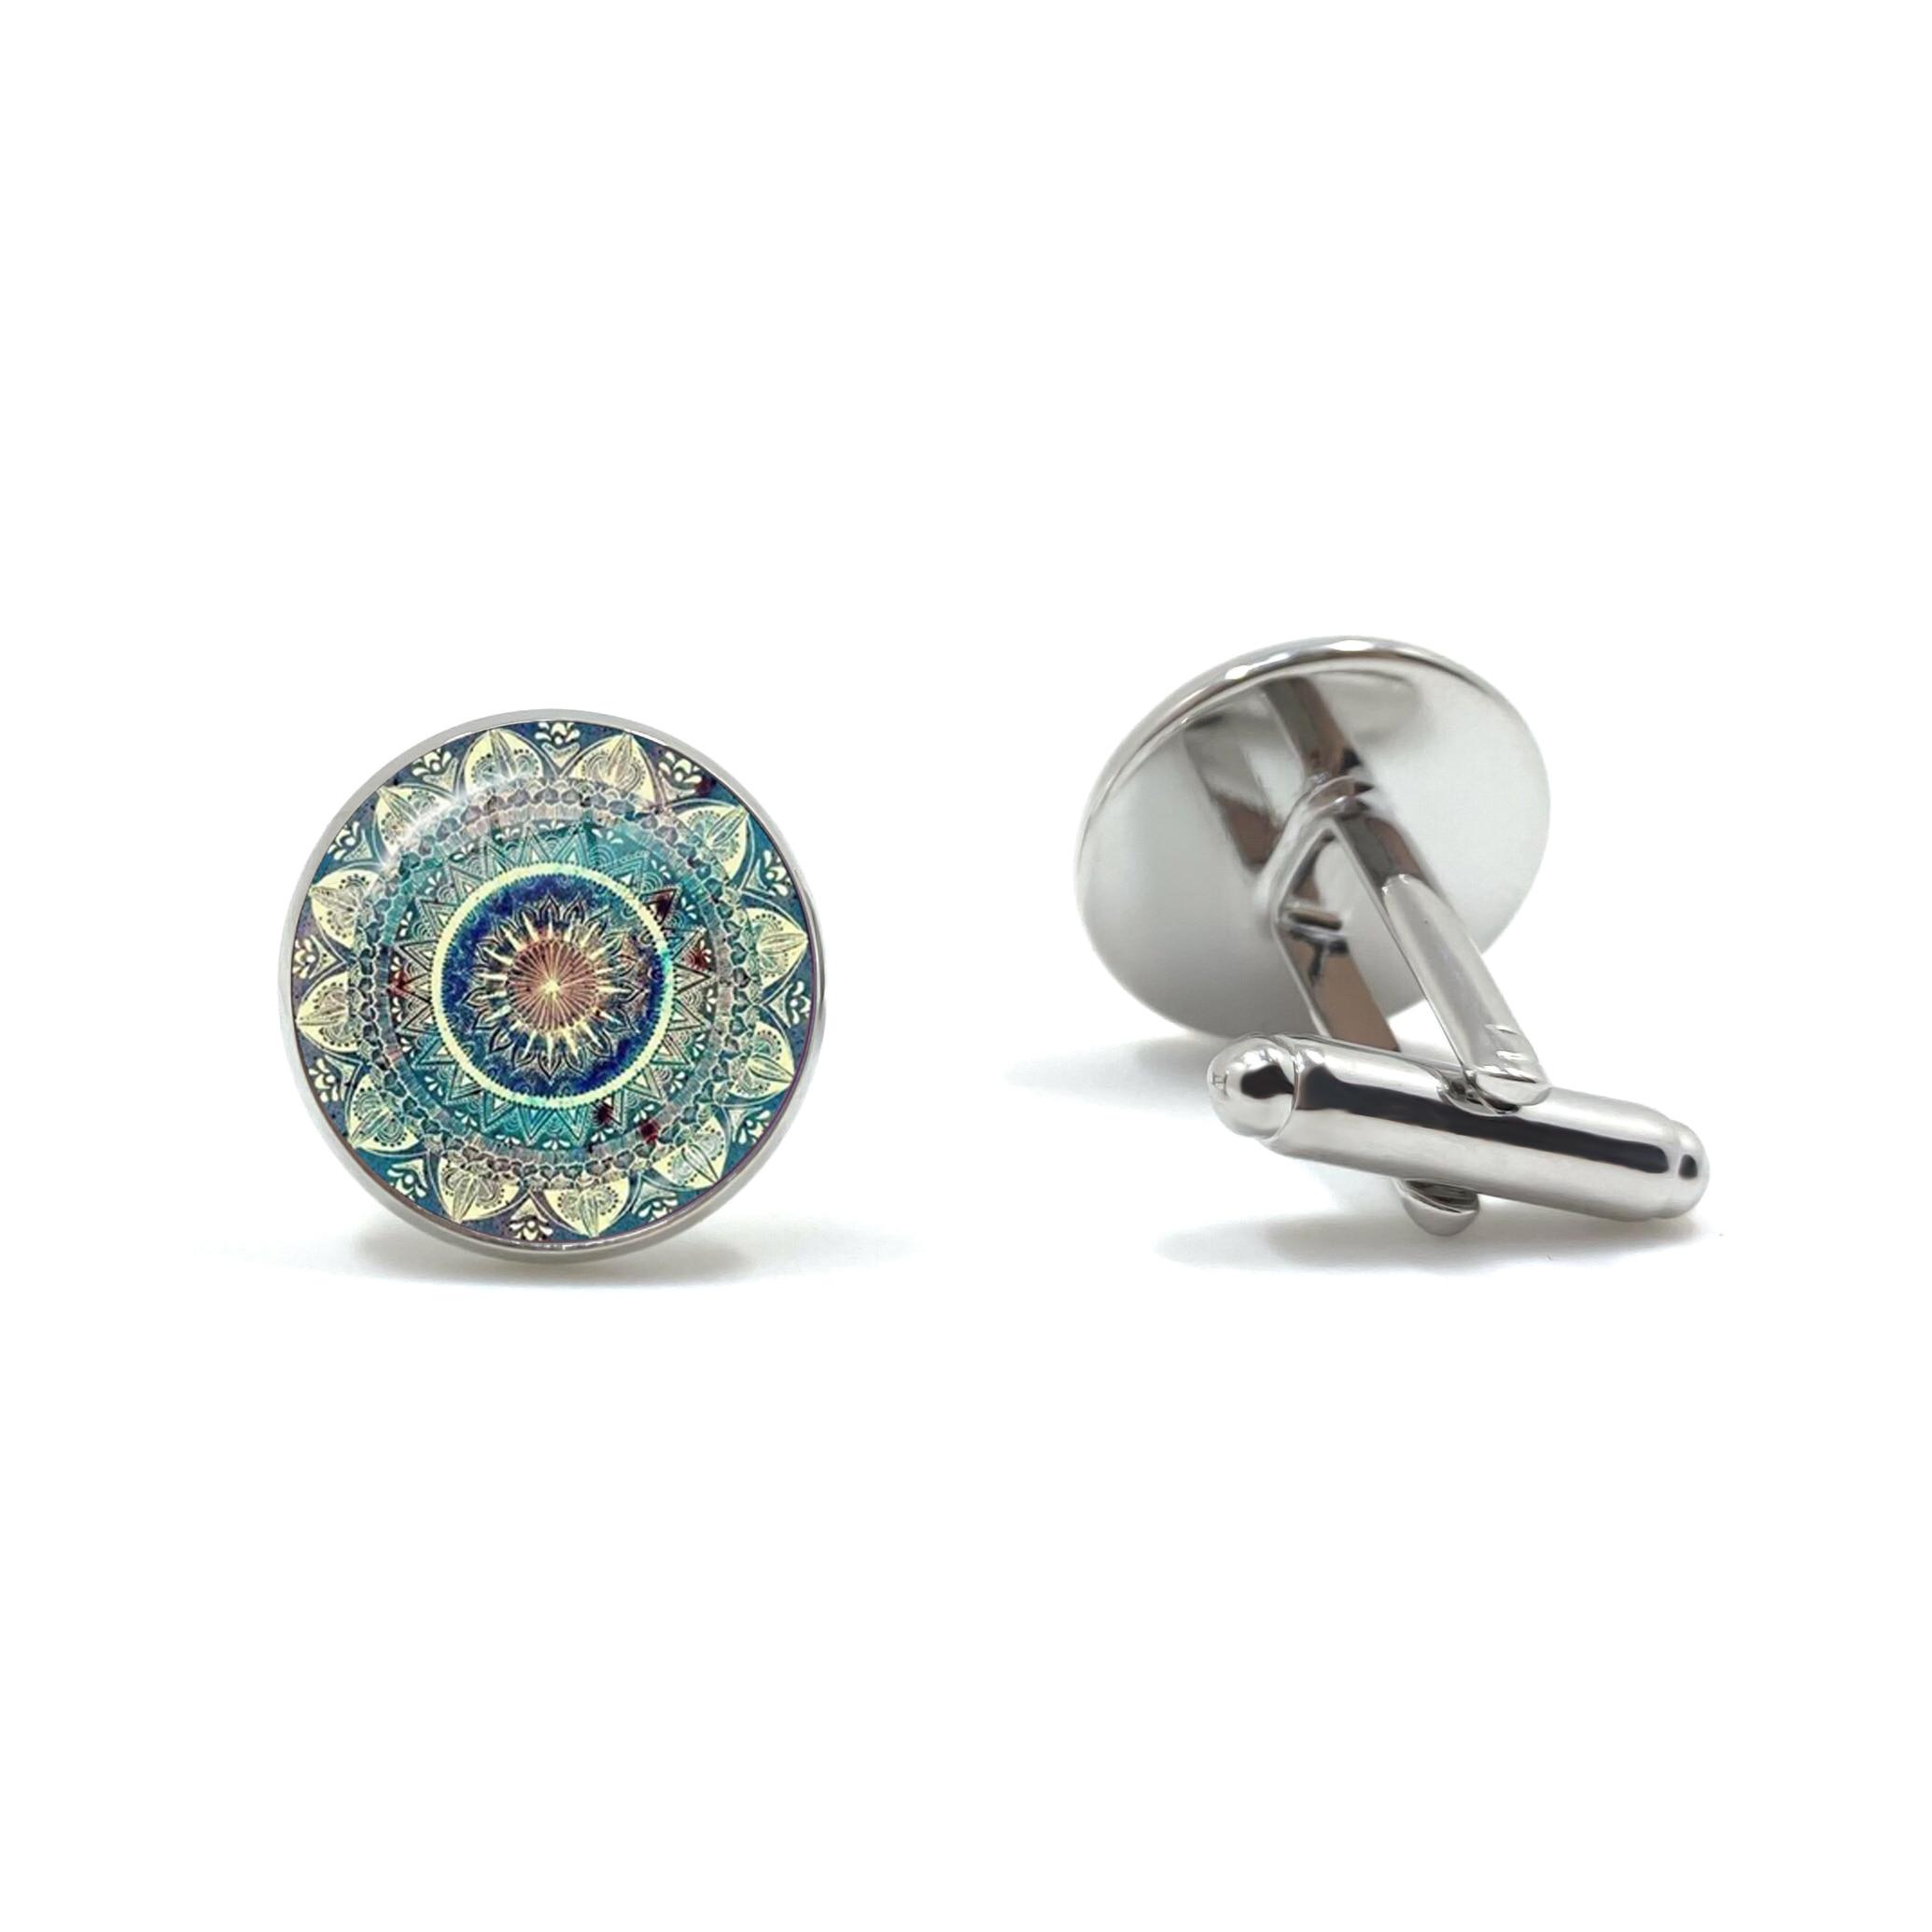 Charm Mandala Art Picture Cufflinks Henna Yoga Om Symbol Zen Buddhism Glass Cabochon Cuff Button For Male Gentleman Shirt Gift